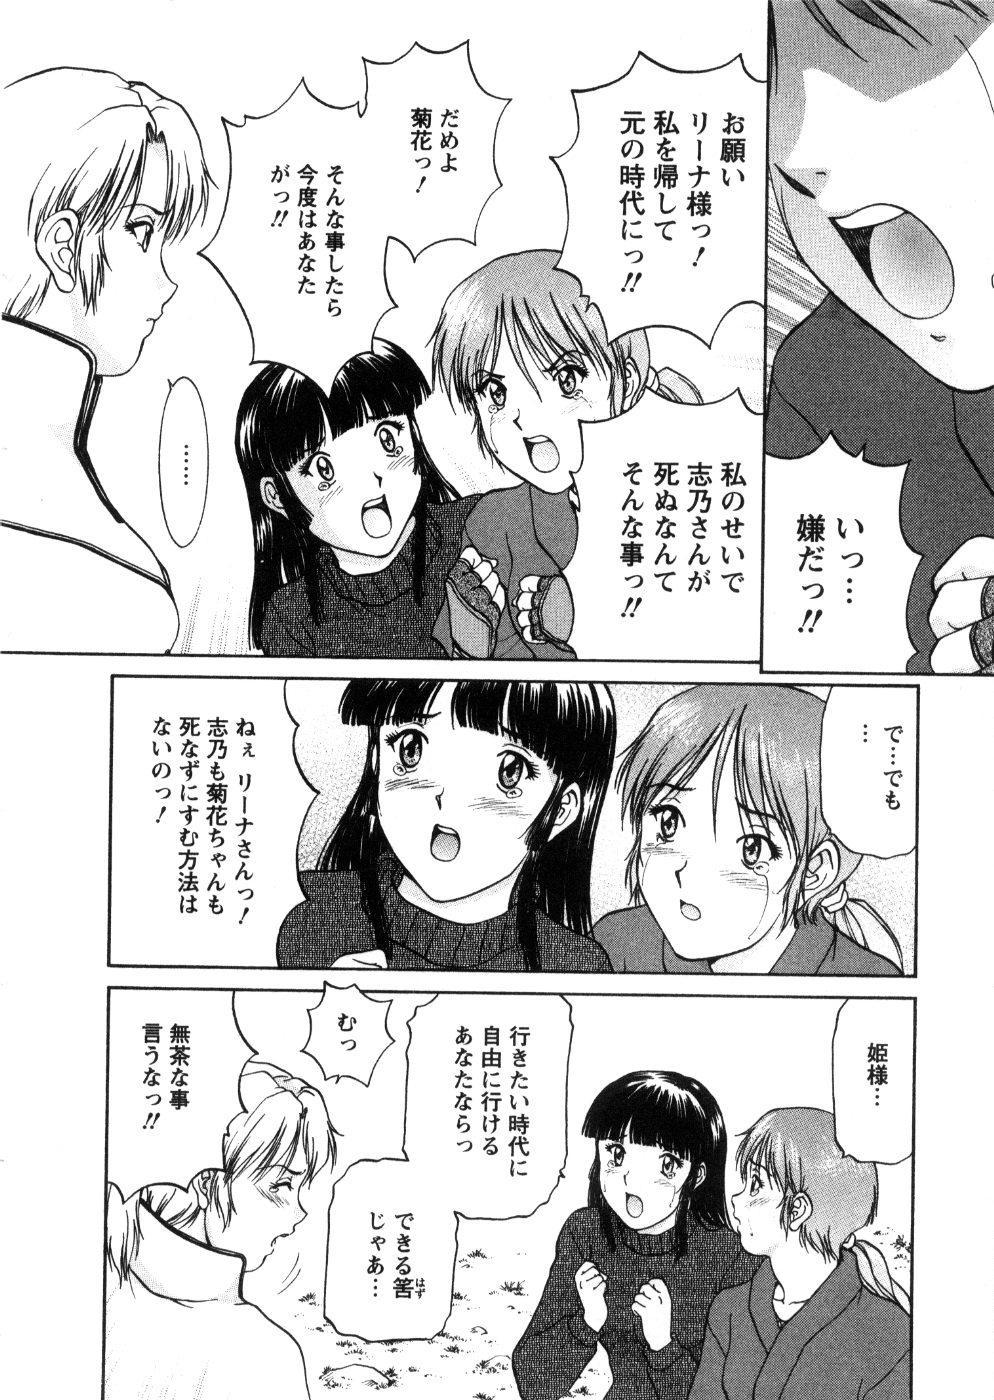 Oneechan-tachi ga Yatte Kuru 03 17